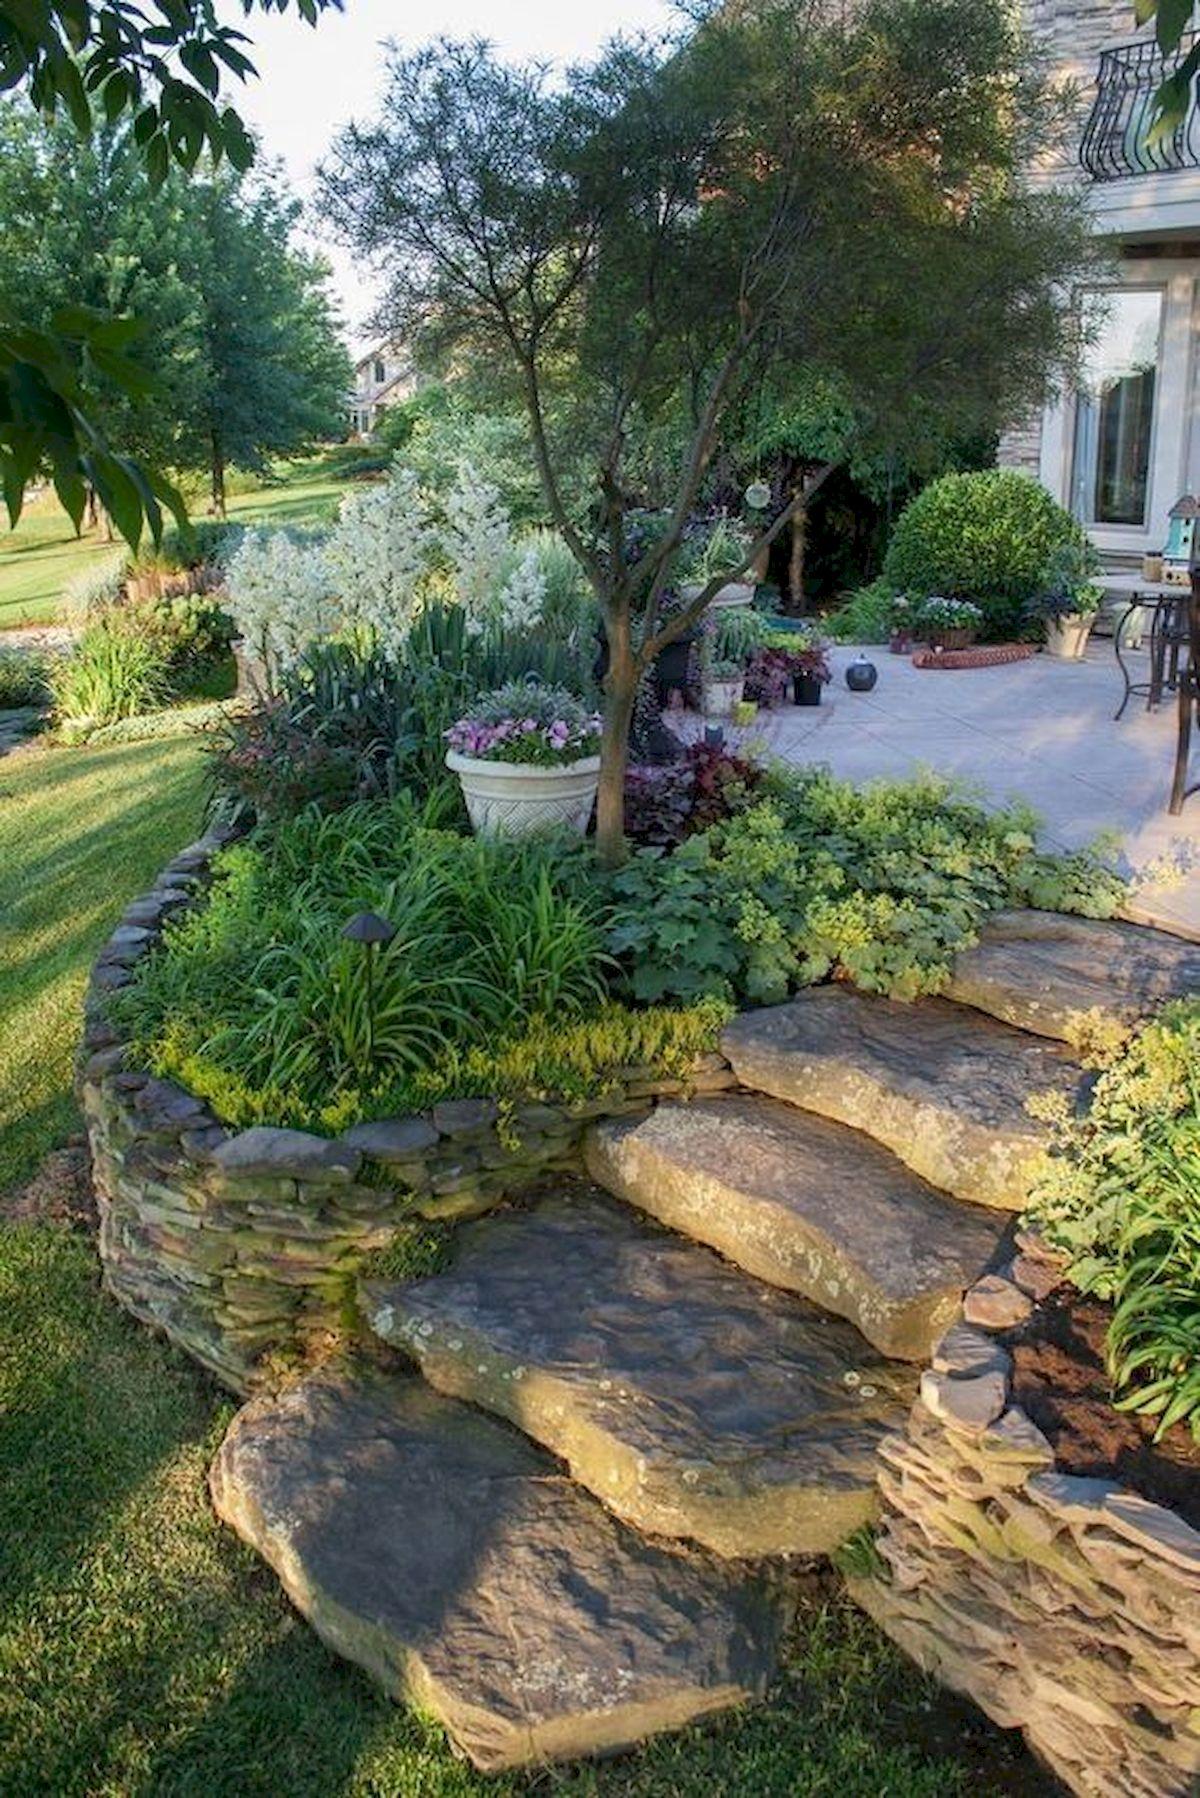 48 Stunning Front Yard Landscaping Ideas That Make Beautiful Garden (32)